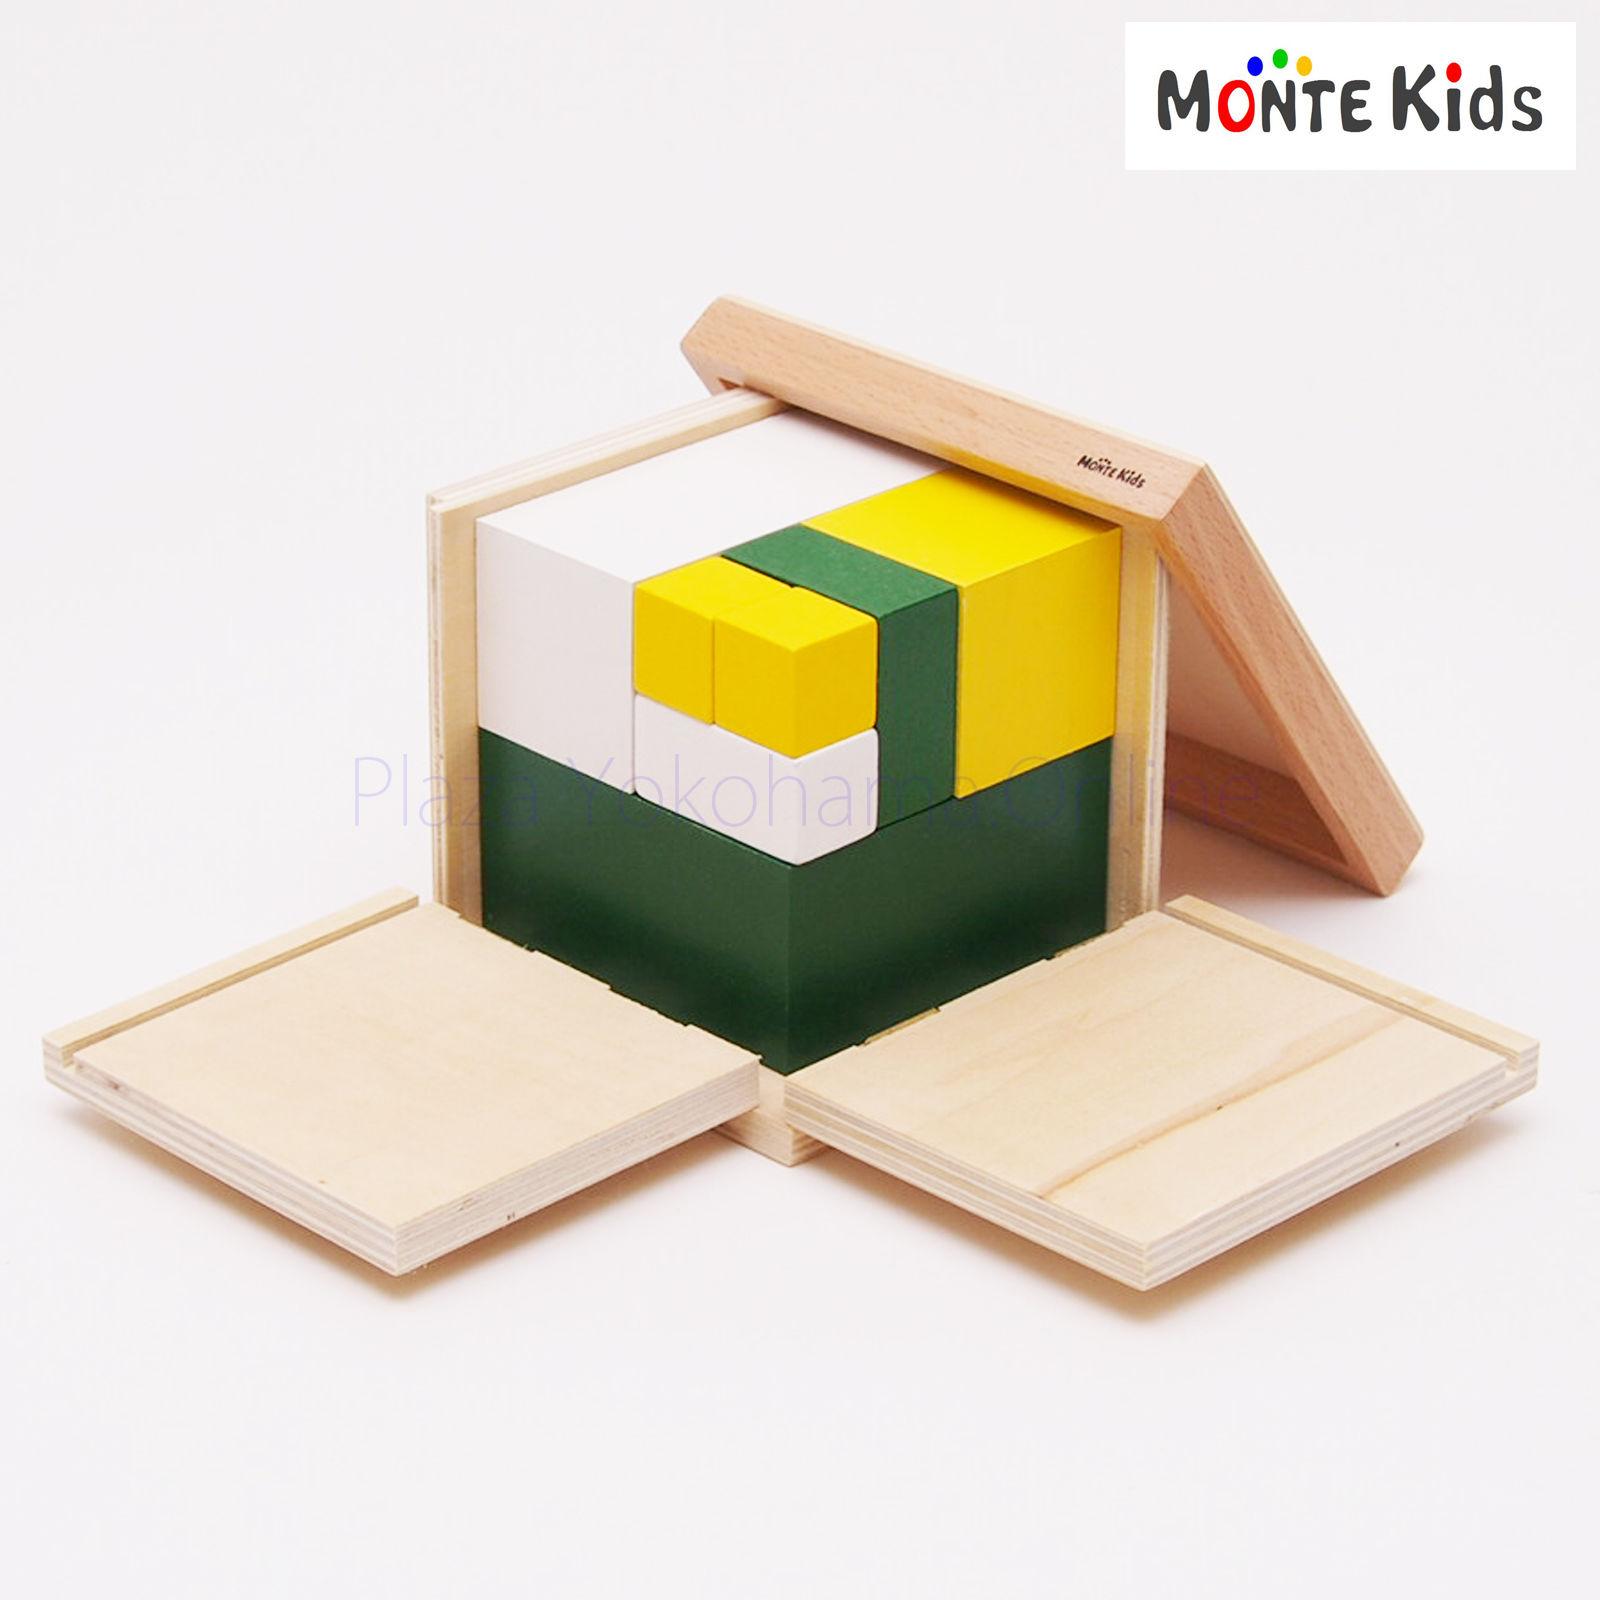 【MONTE Kids】MK-008  2の累乗キューブ  ≪OUTLET≫